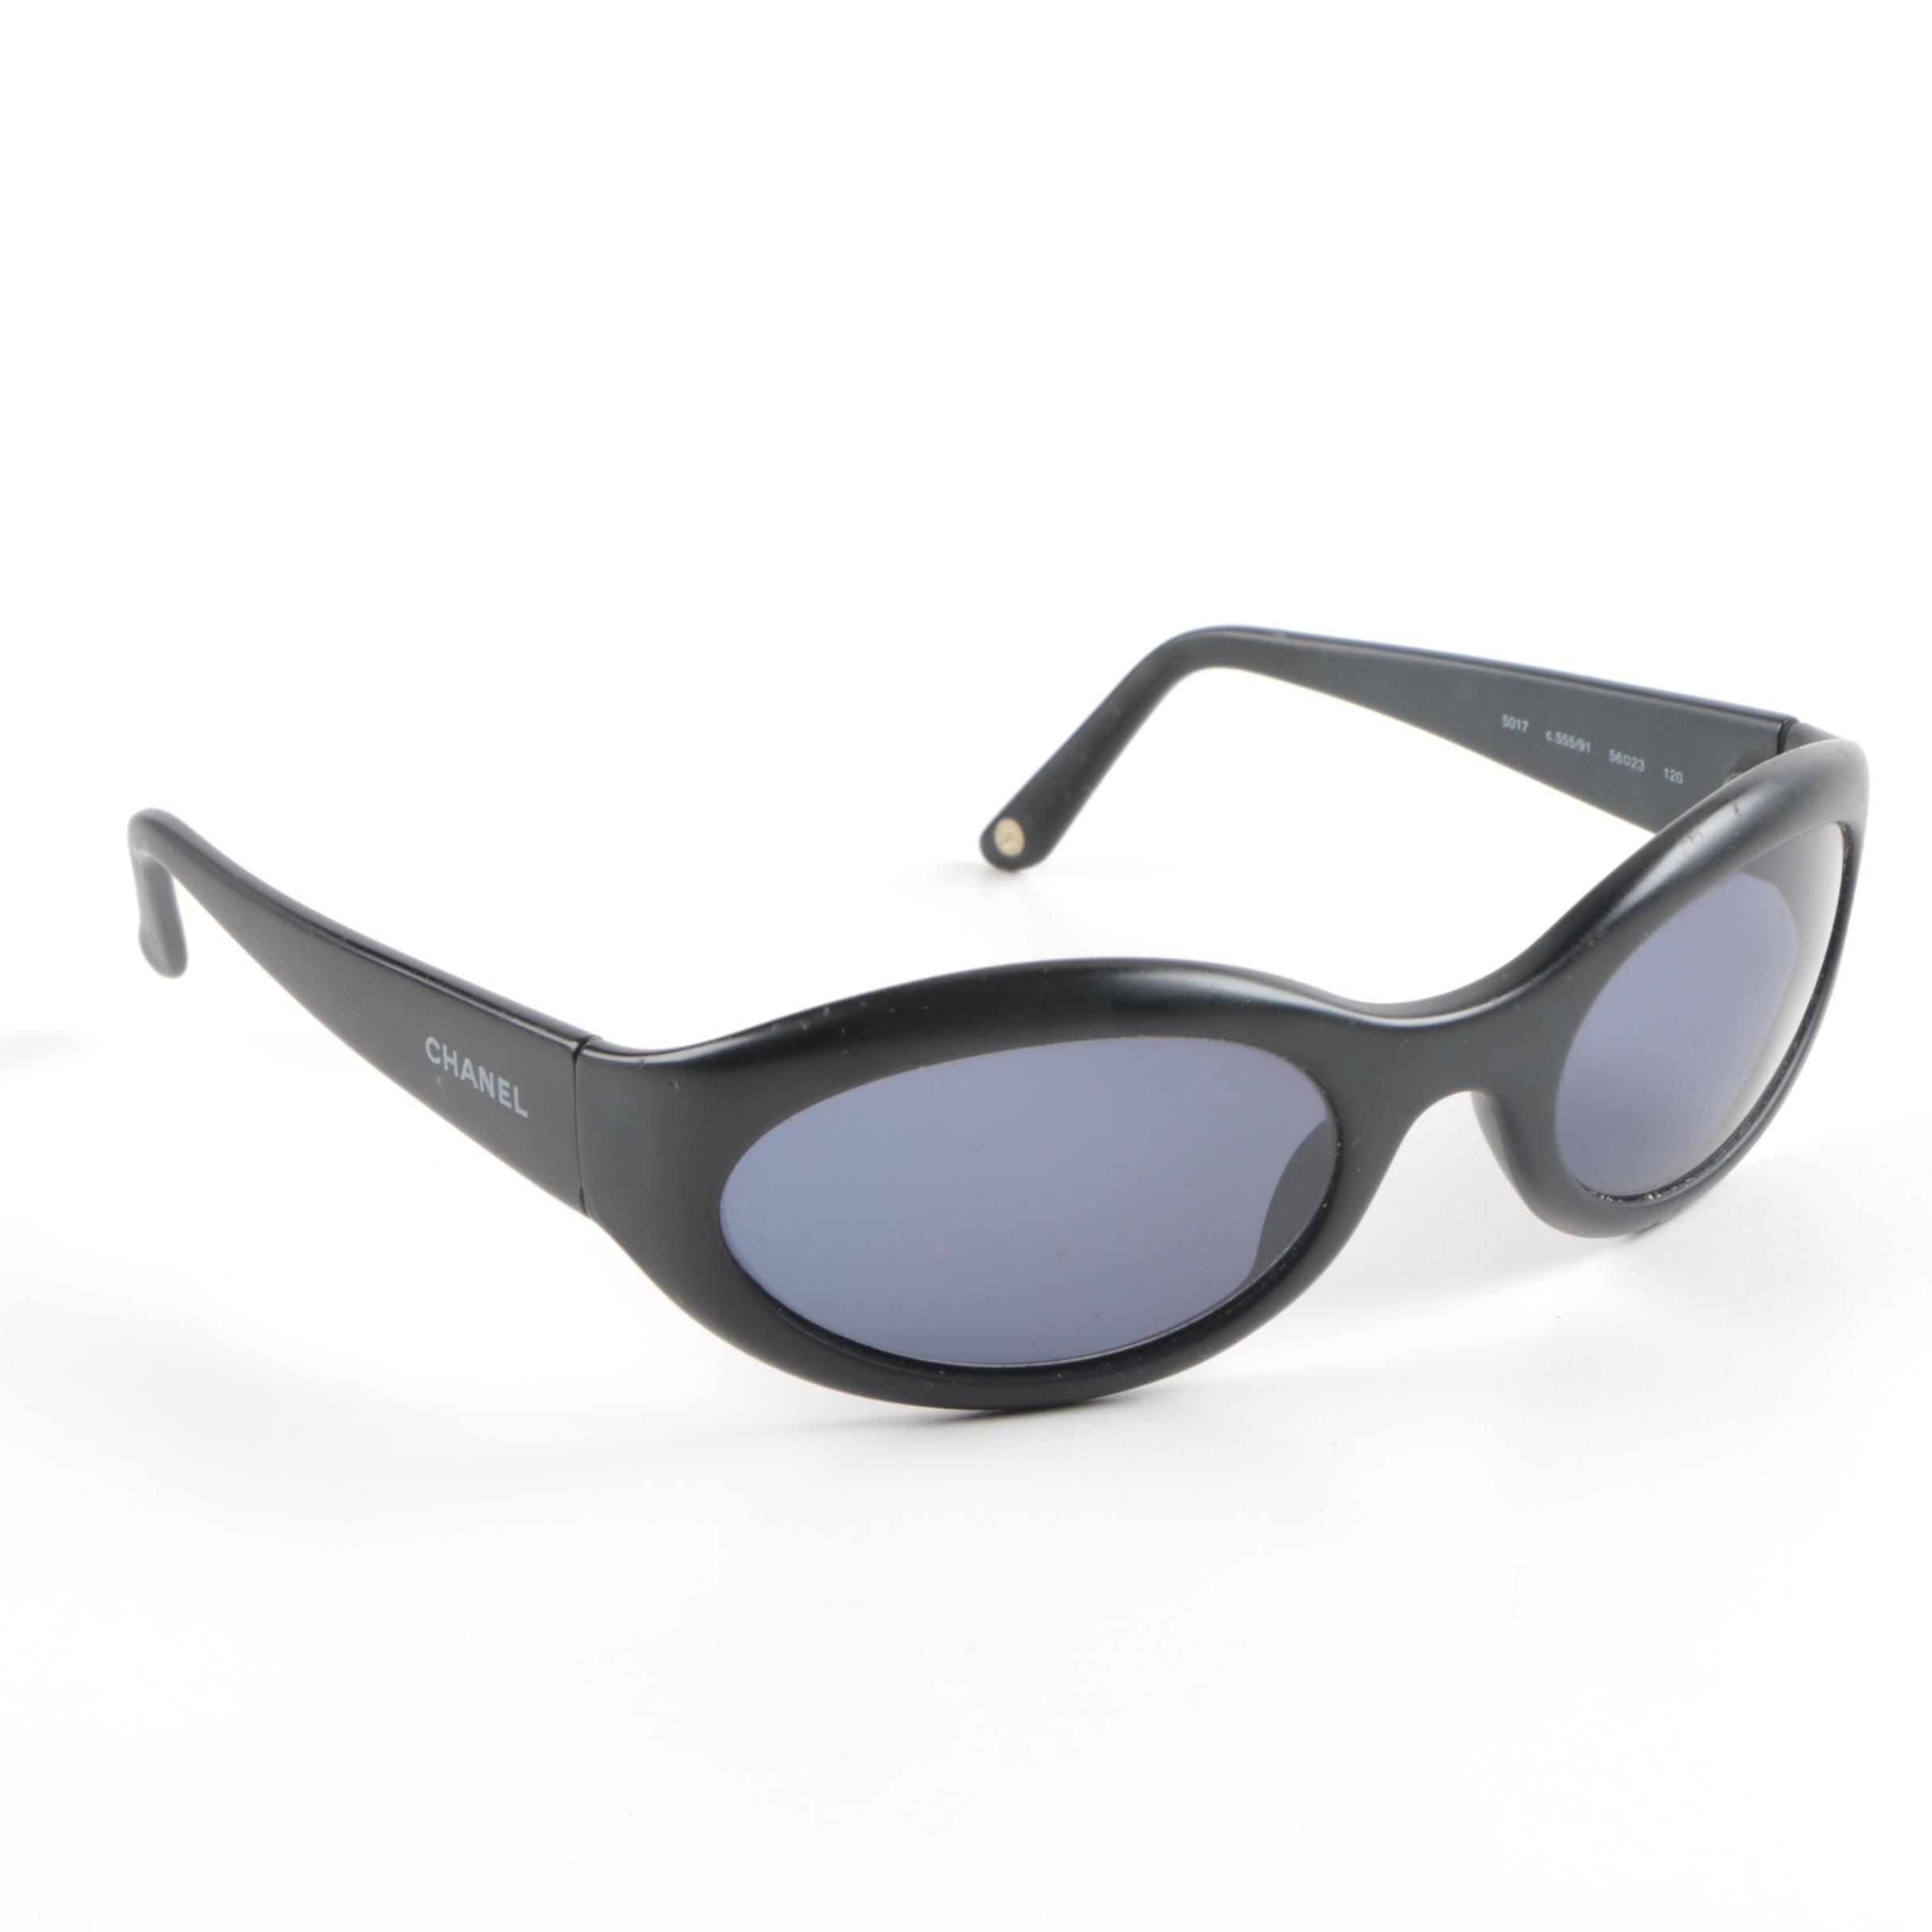 Chanel 5017 Sunglasses